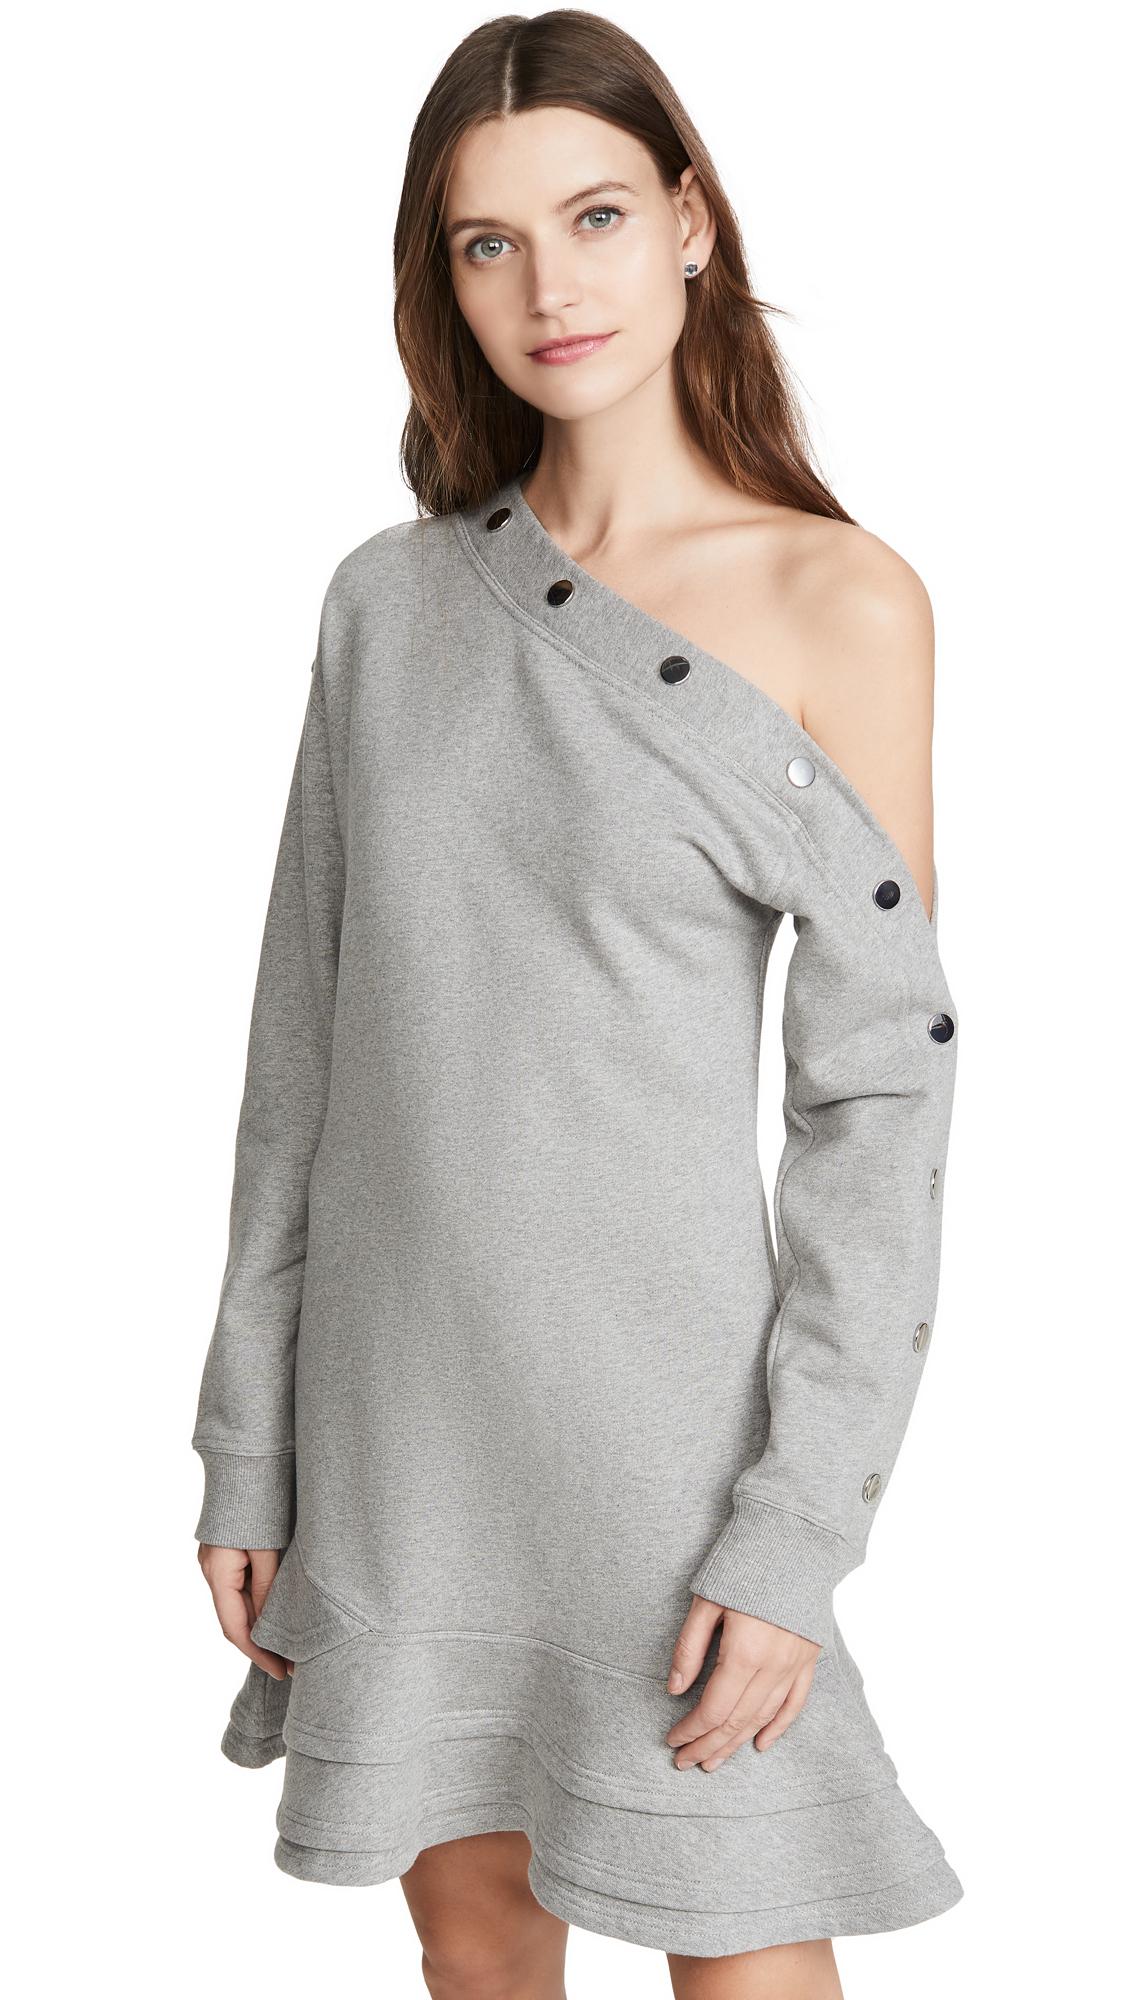 Derek Lam 10 Crosby Cressida Sweatshirt Dress - 50% Off Sale